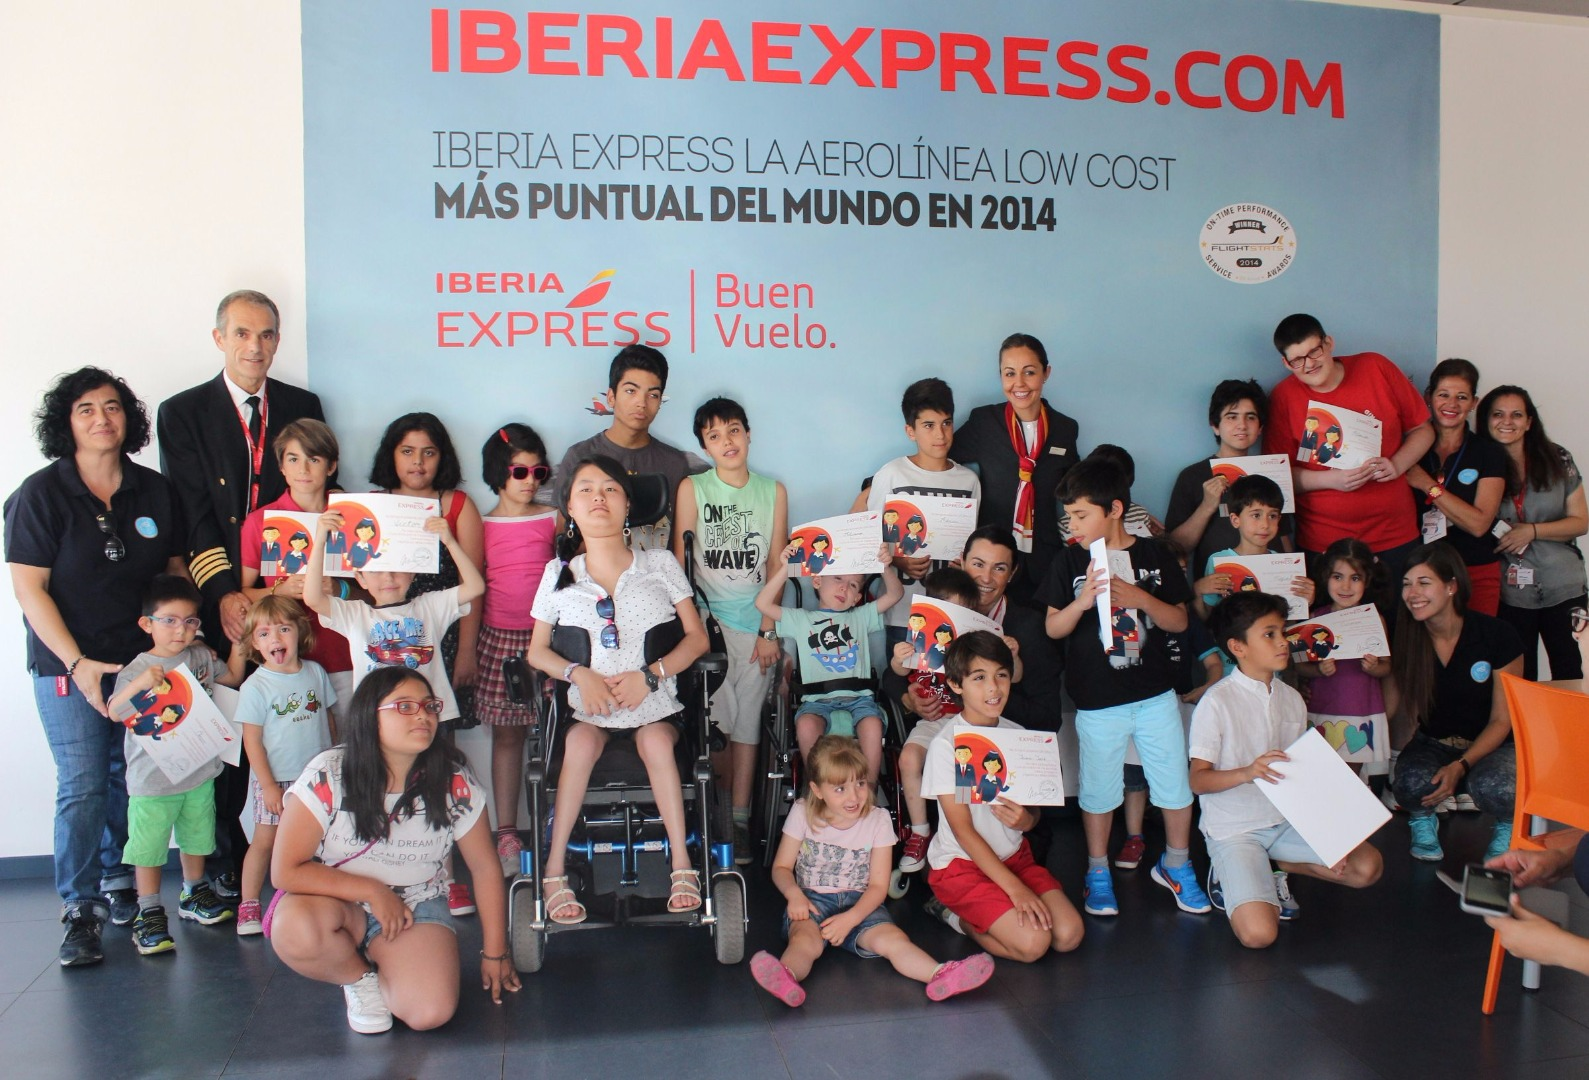 responsabilità sociale d'impresa di Iberia Express.